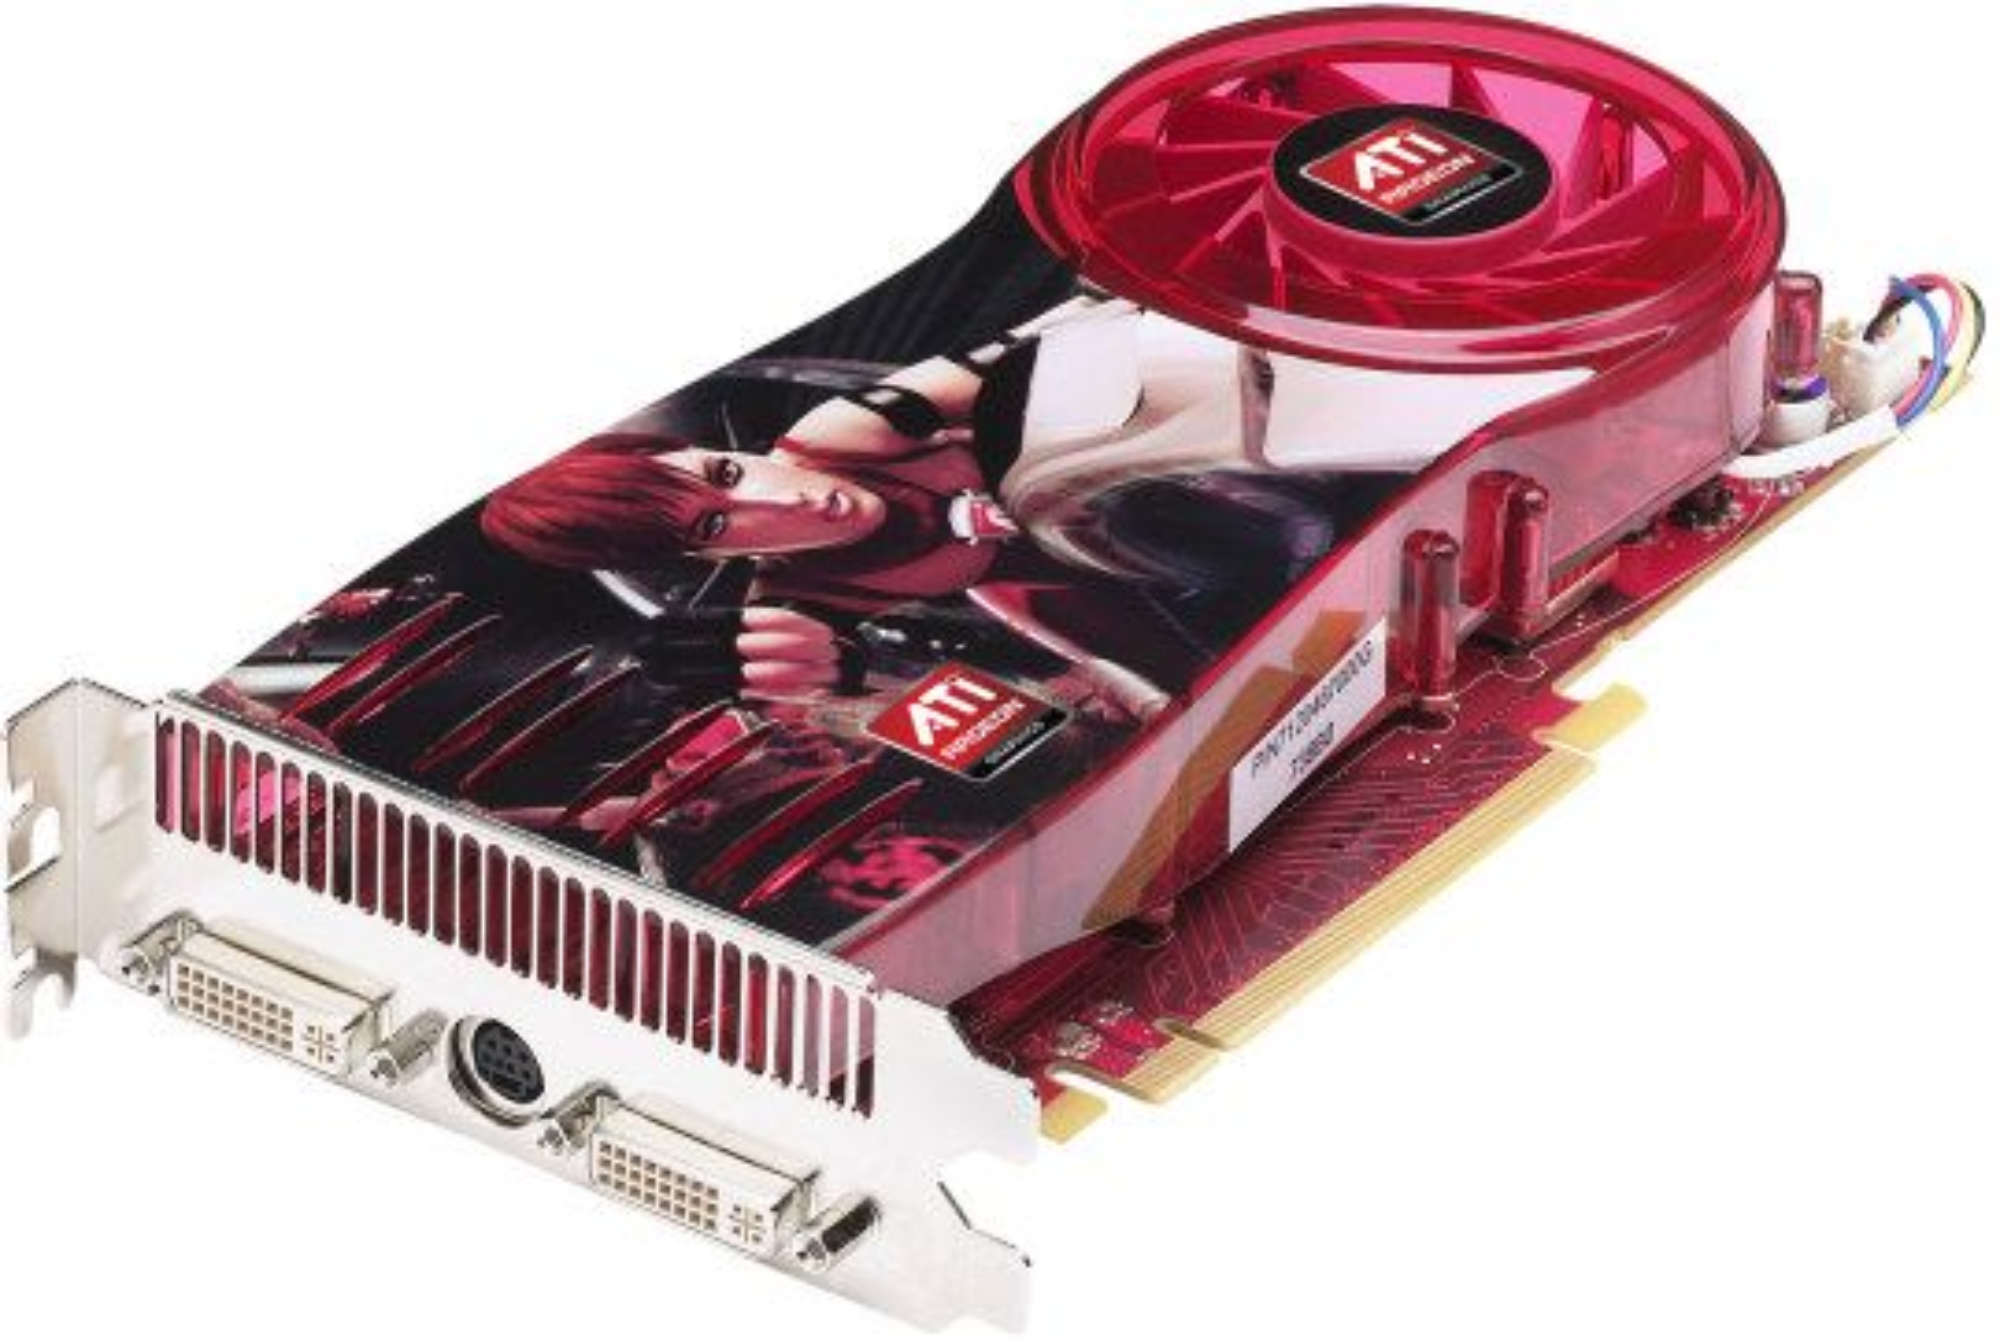 Radeon HD 3870 får snart nye storebrødre